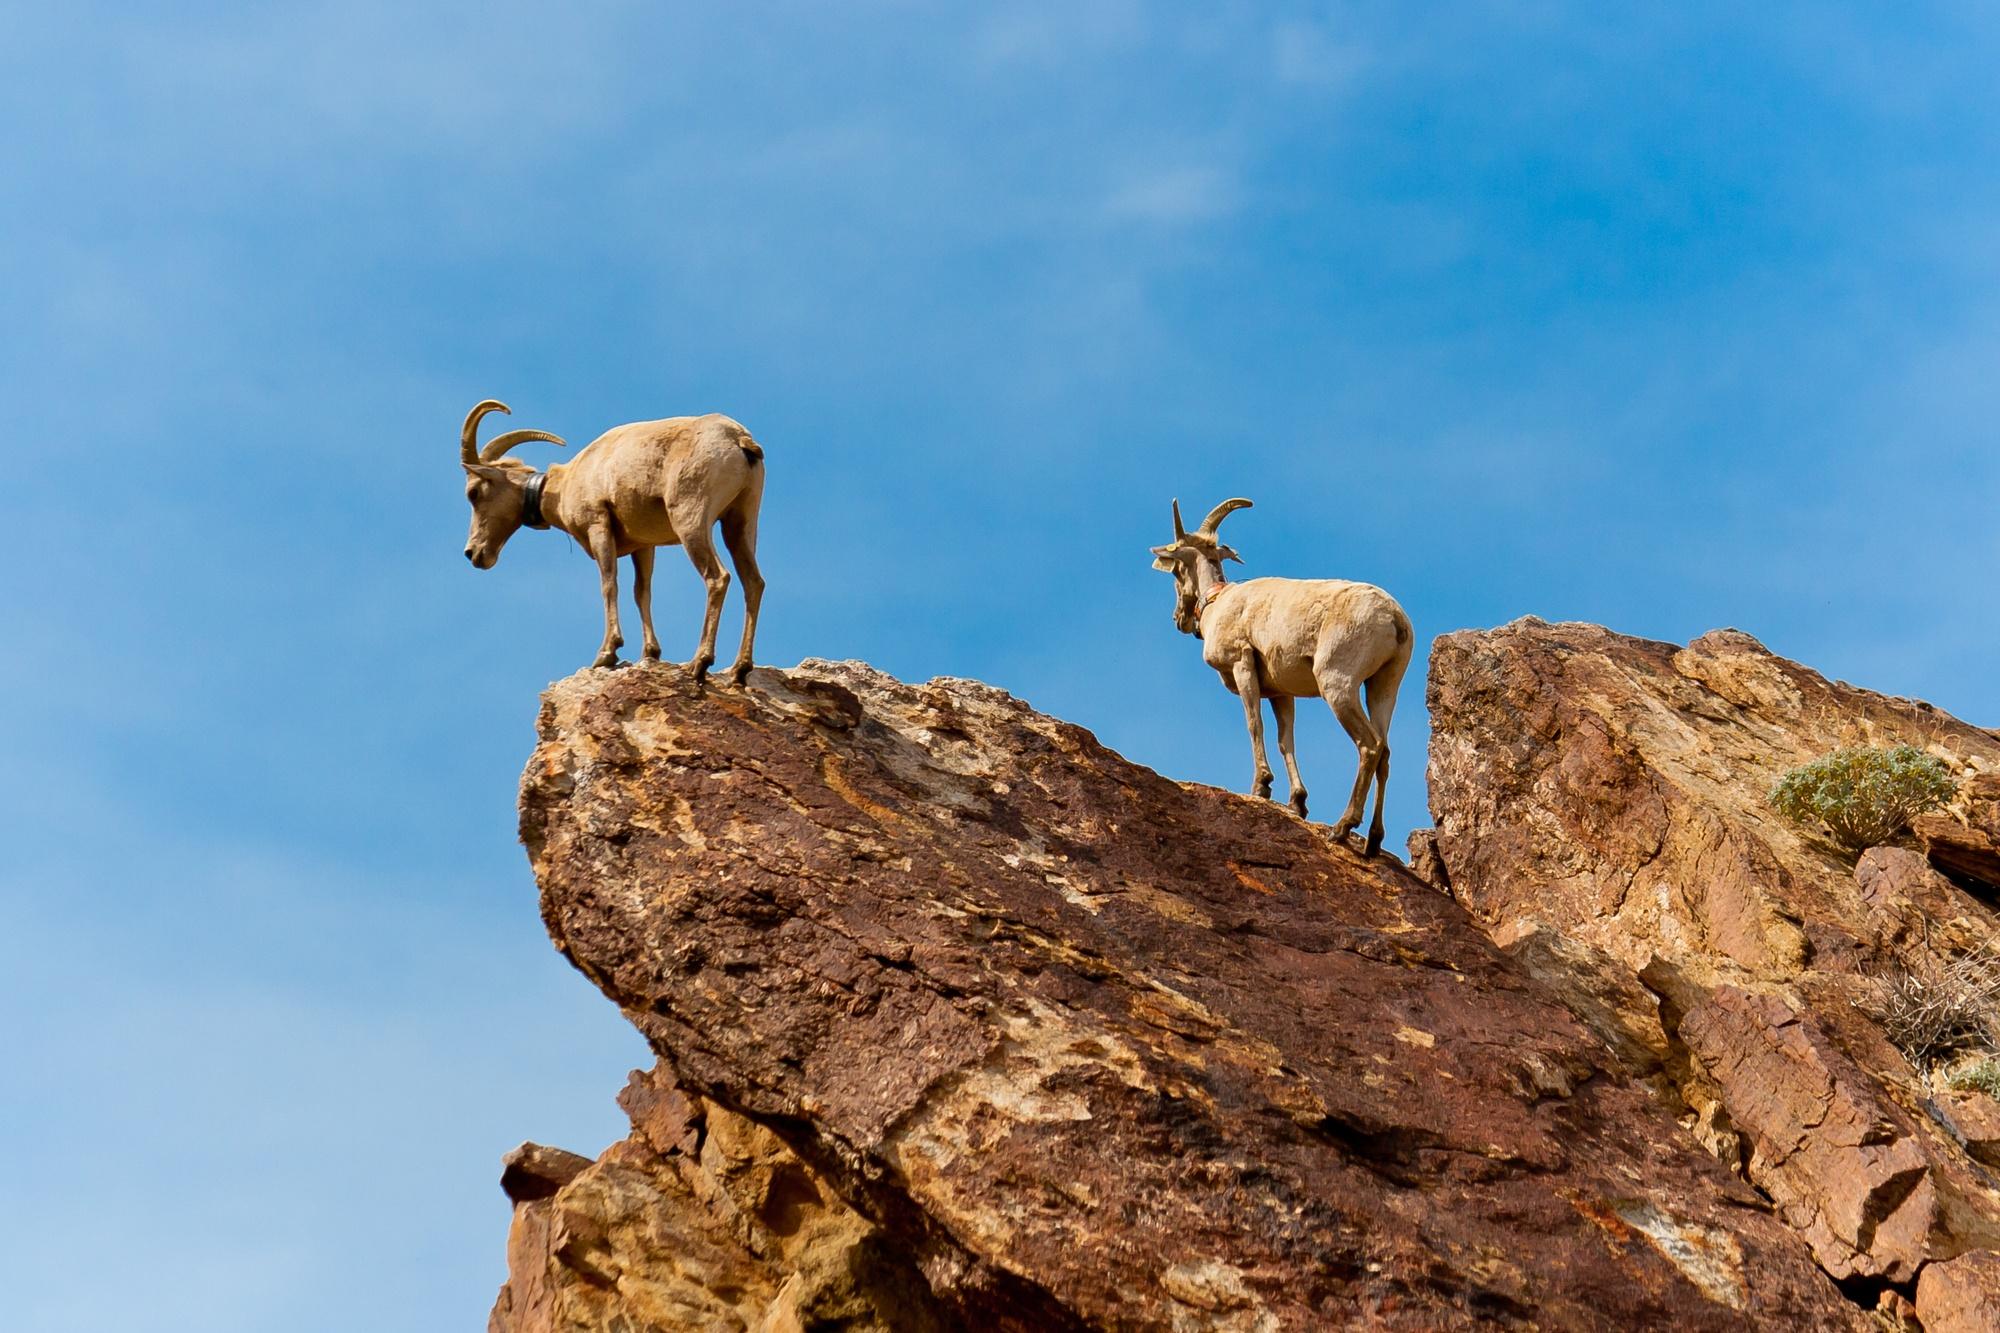 Desert Bighorn Sheep in Anza Borrego Desert State Park